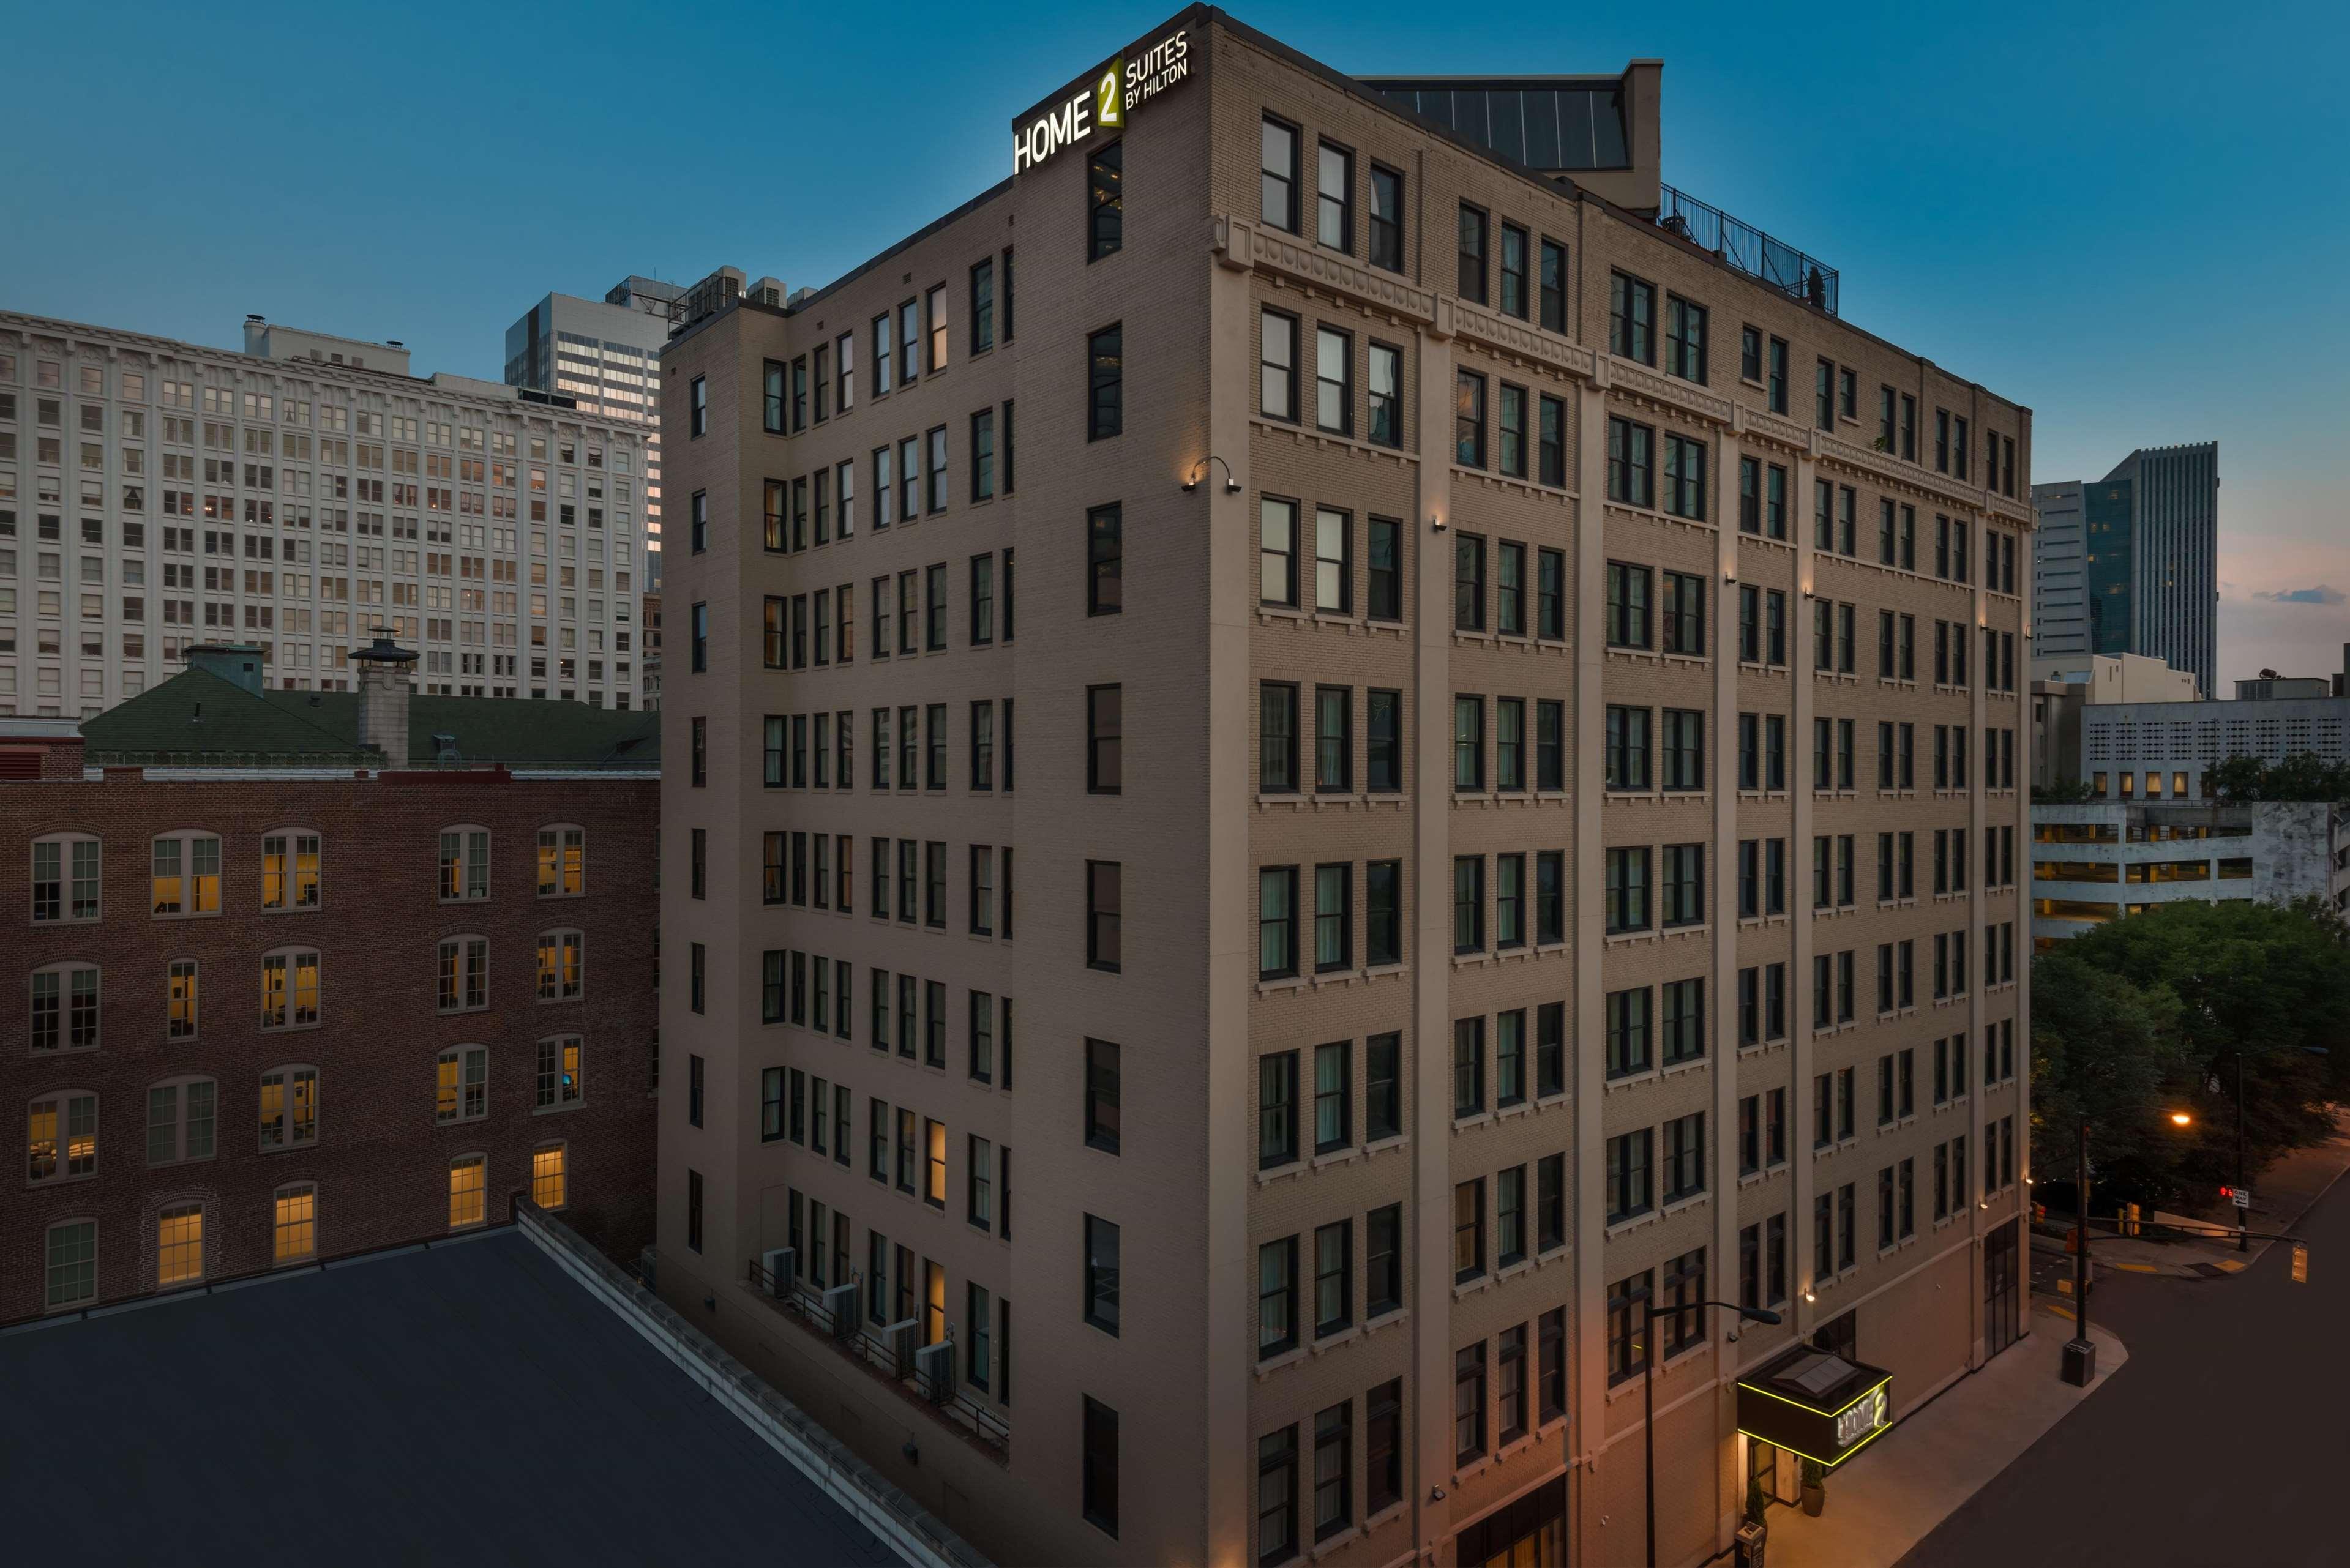 Home2 Suites by Hilton Atlanta Downtown image 26